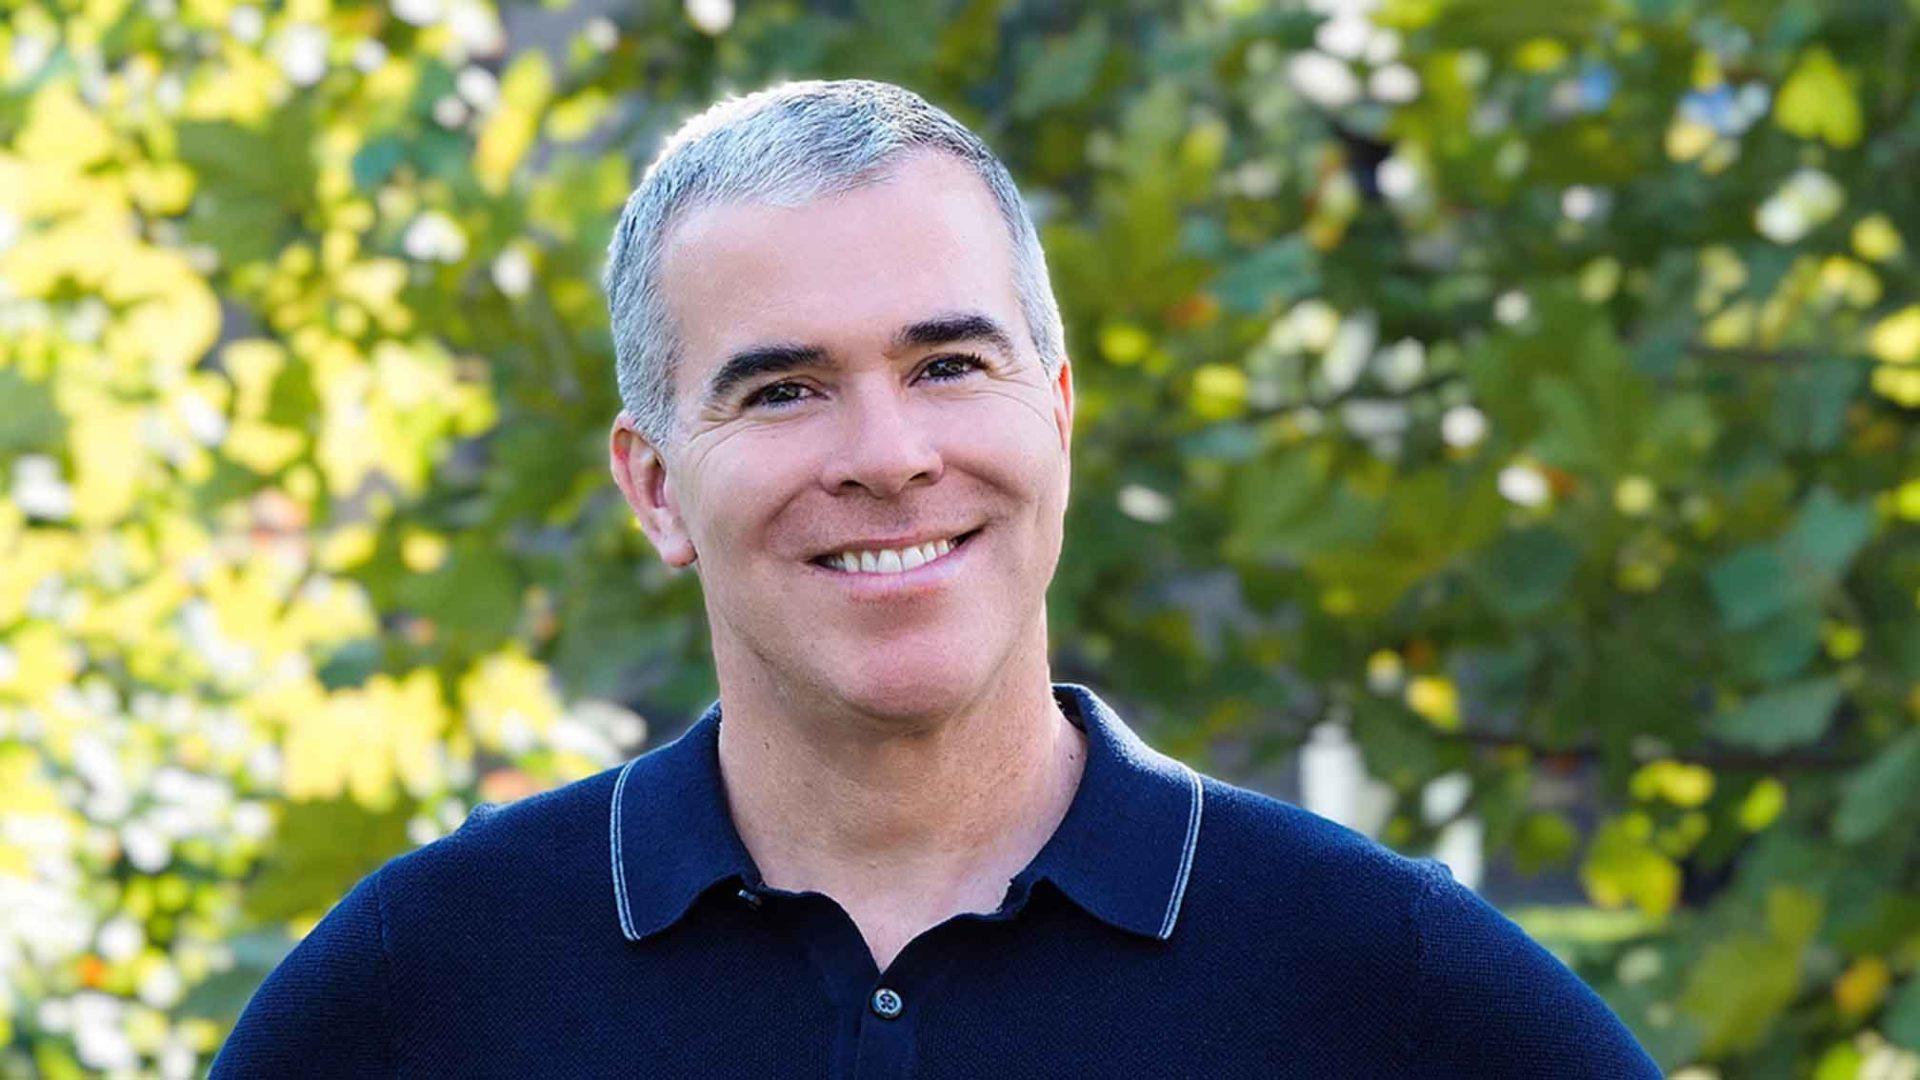 Sarofsky Tom Pastorelle Senior Editor | STASH MAGAZINE